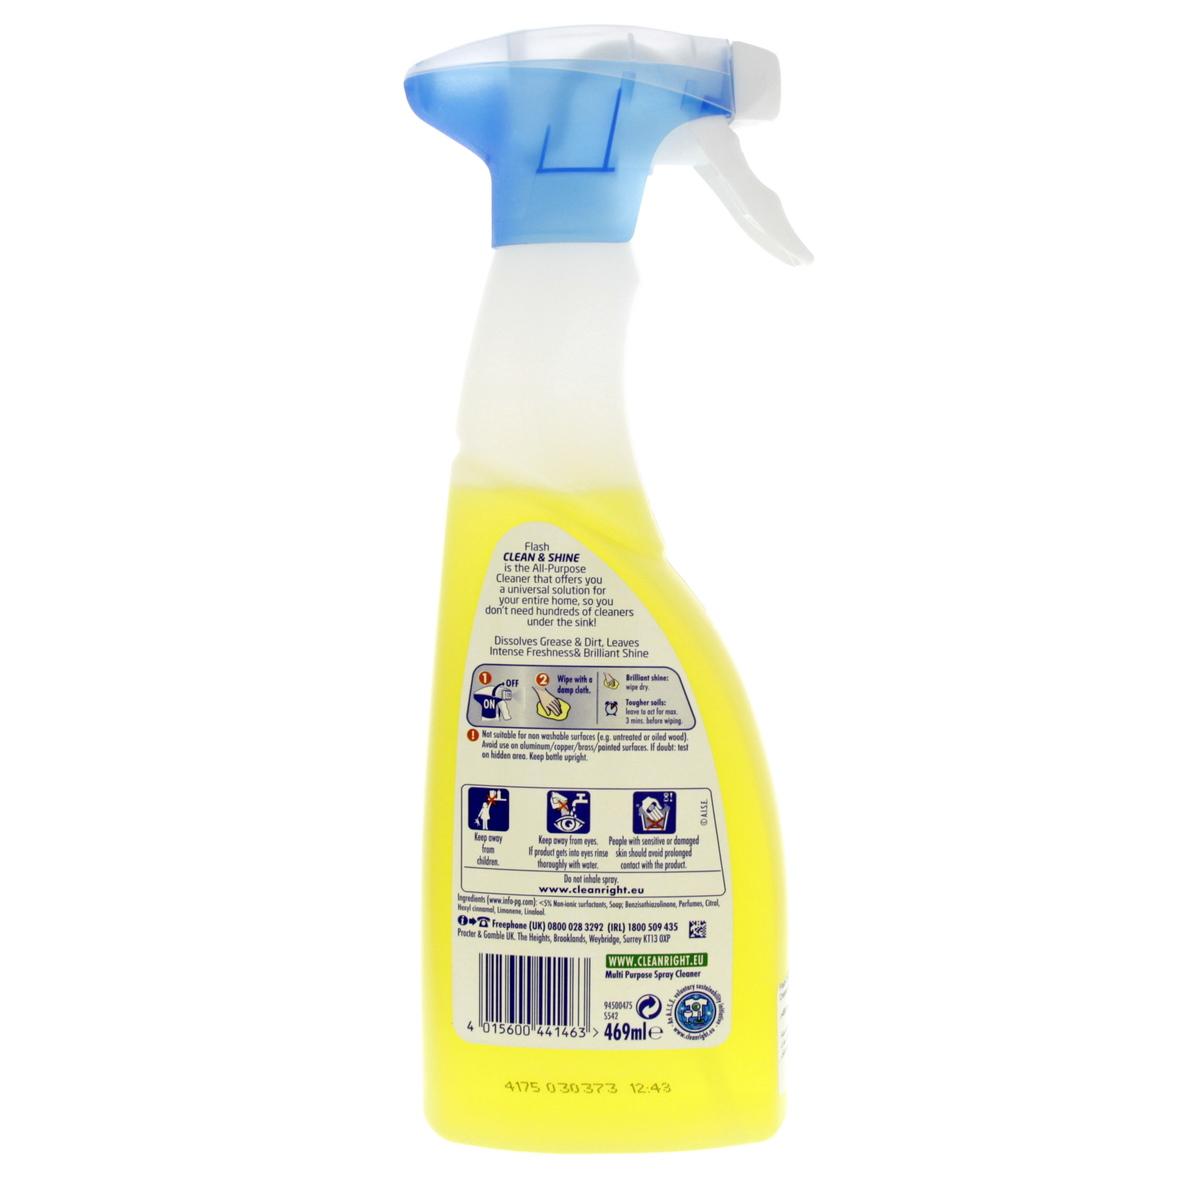 Buy Flash Clean & Shine Lemon All Purpose Cleaner 469ml